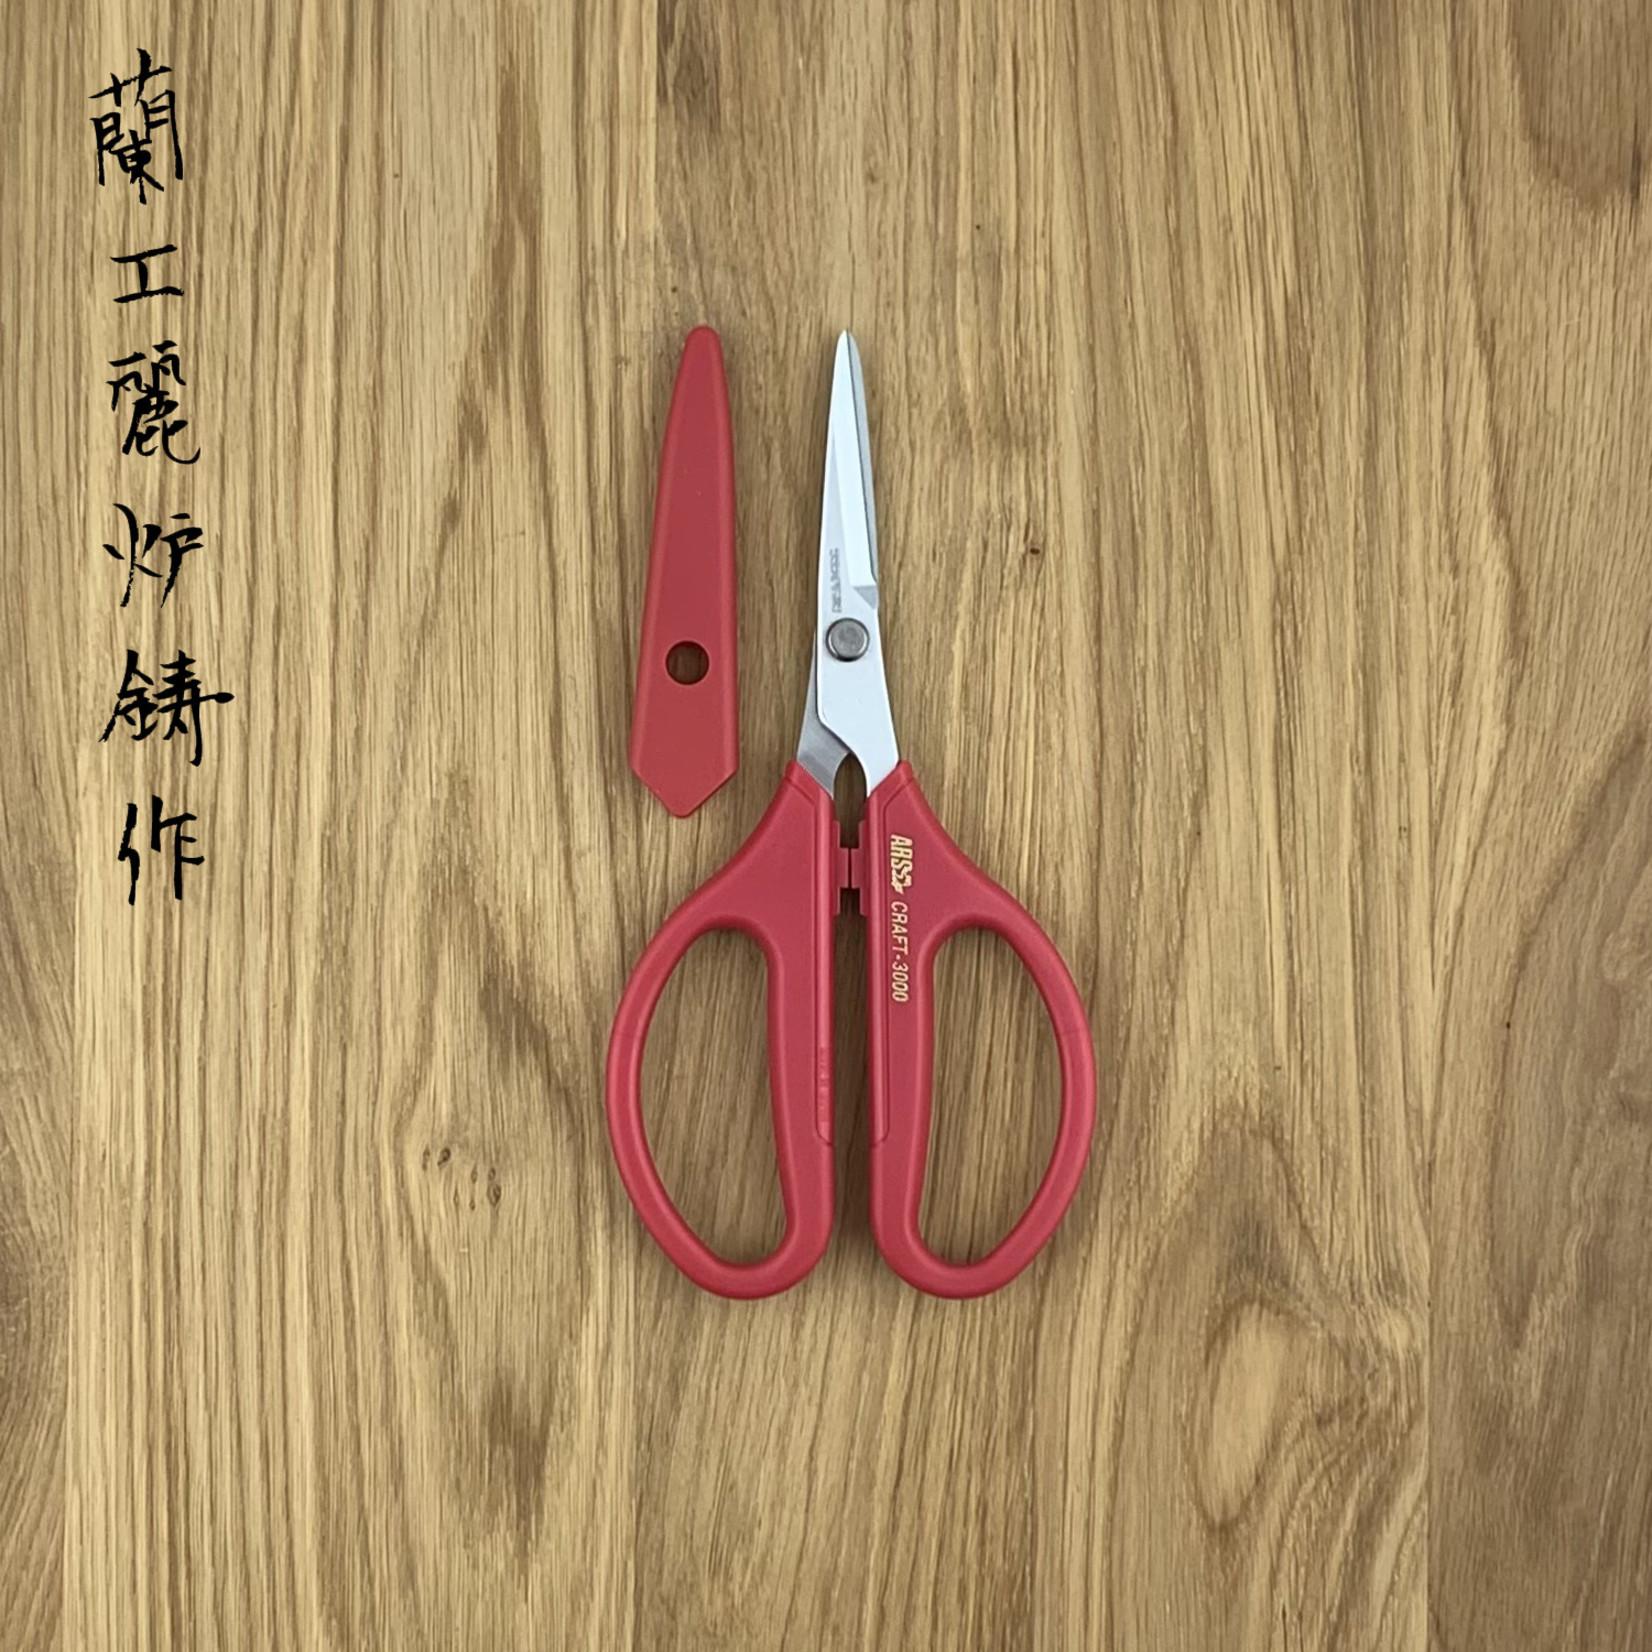 SAKAI TAKAYUKI Herb Scissors 3000R 43943